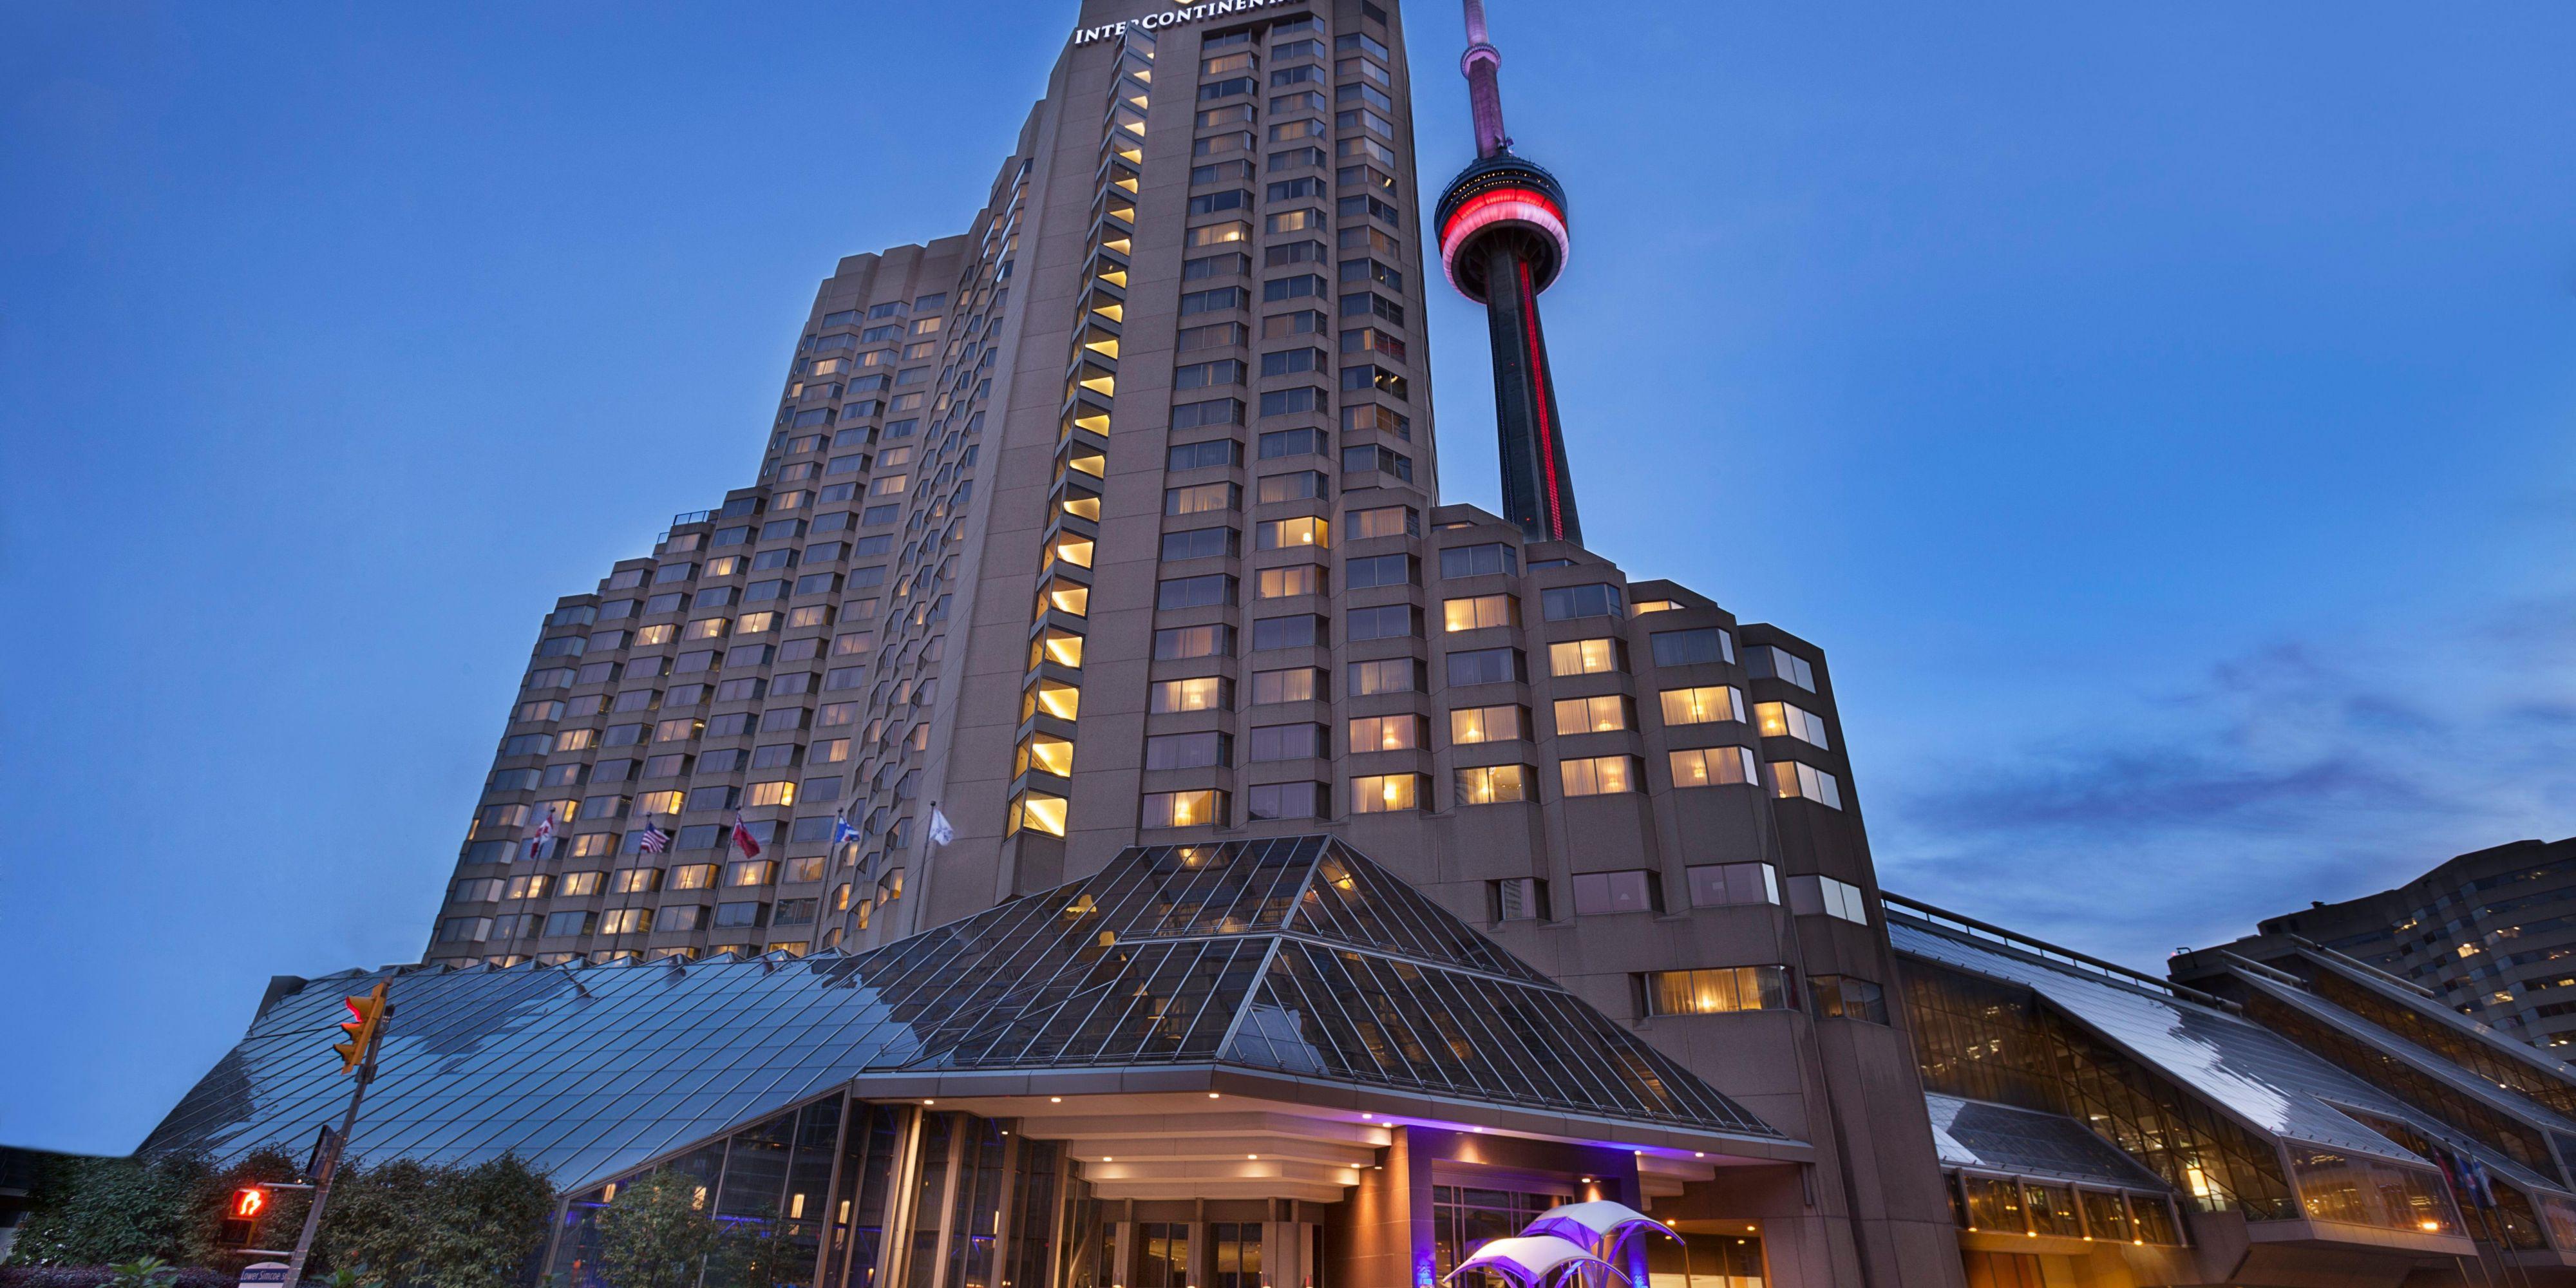 InterContinental Toronto Centre - Hotel Reviews & Photos